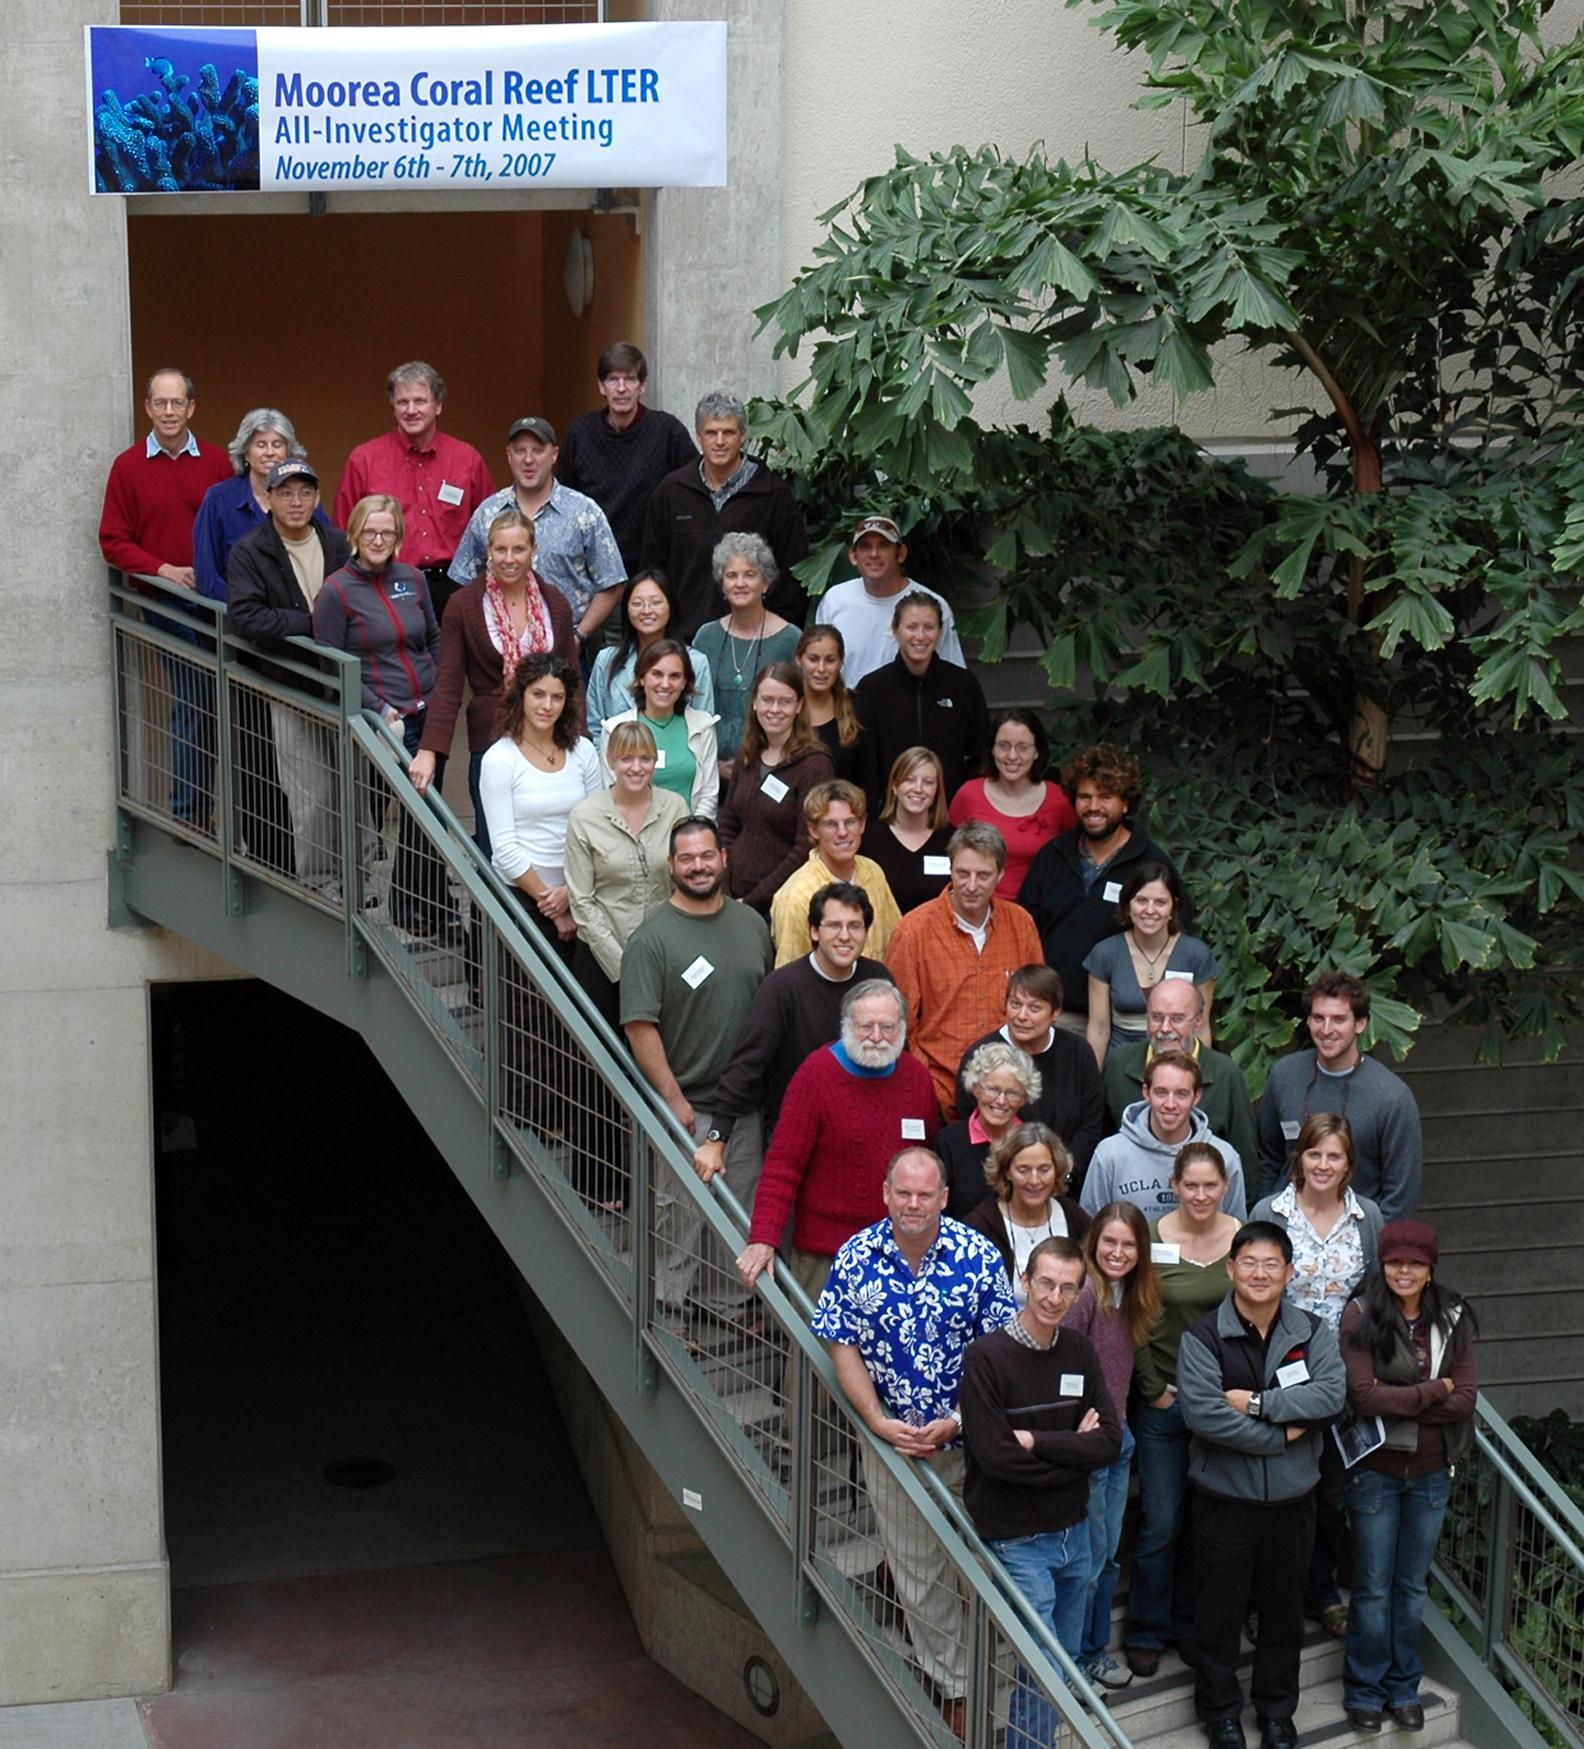 2007 MCR All Investigators Meeting photo